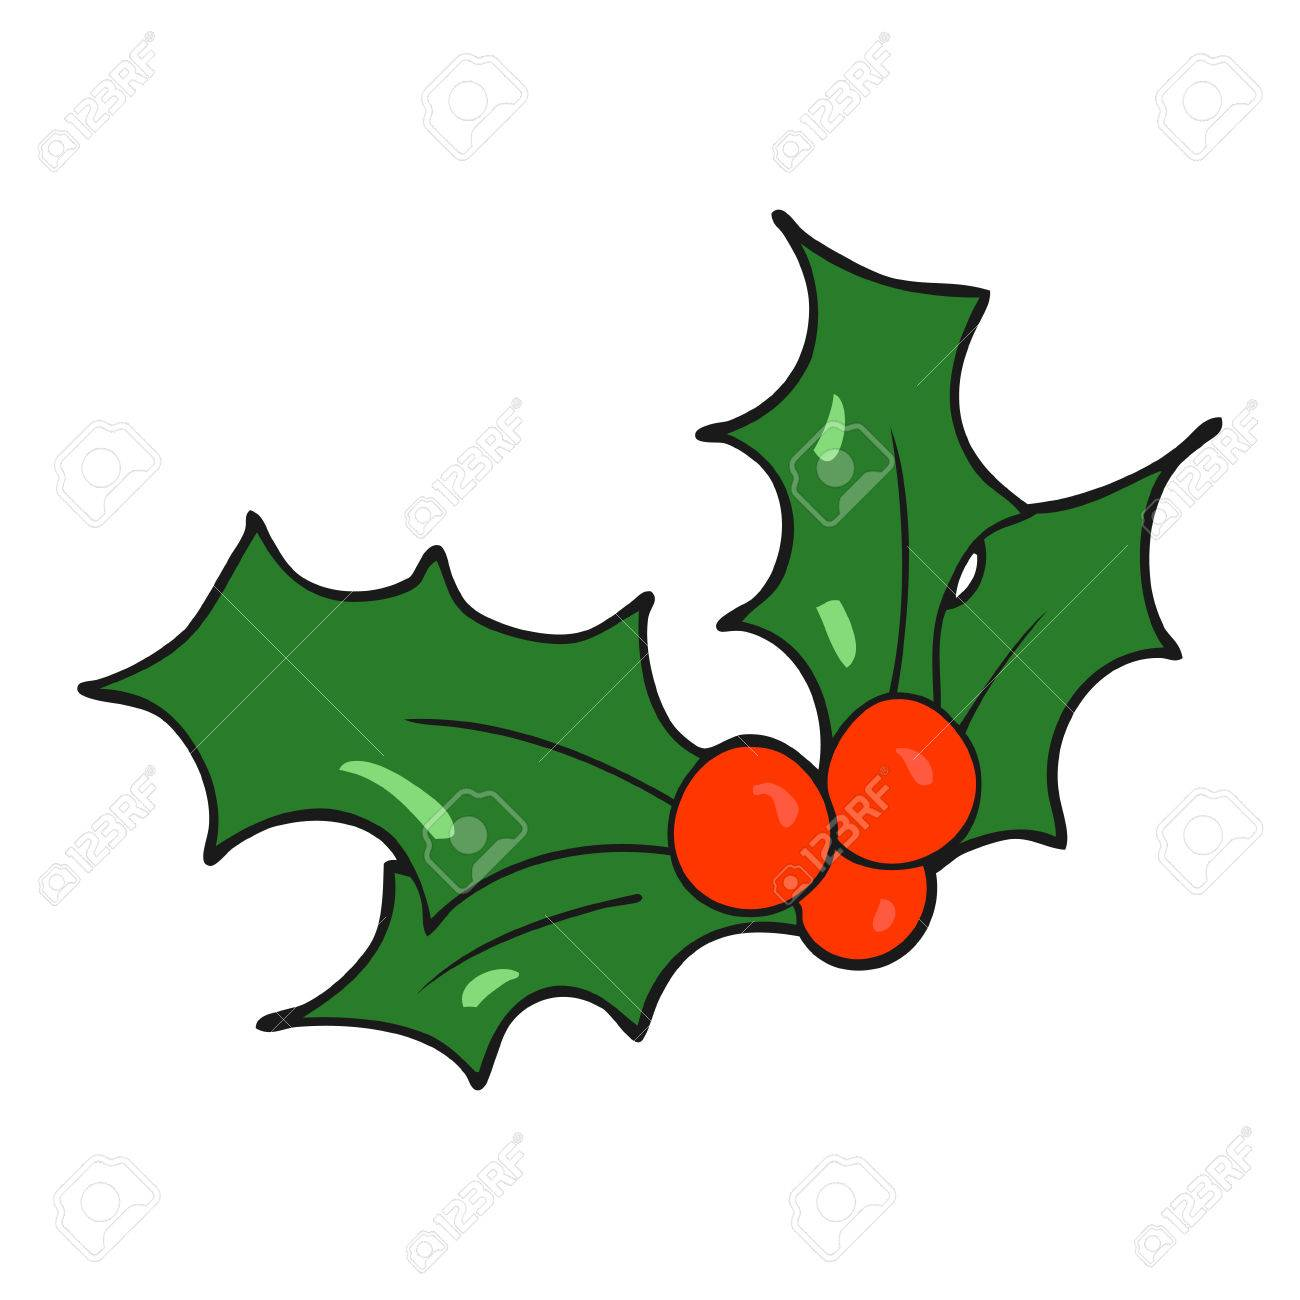 Christmas Holly Cartoon.Freehand Drawn Cartoon Christmas Holly